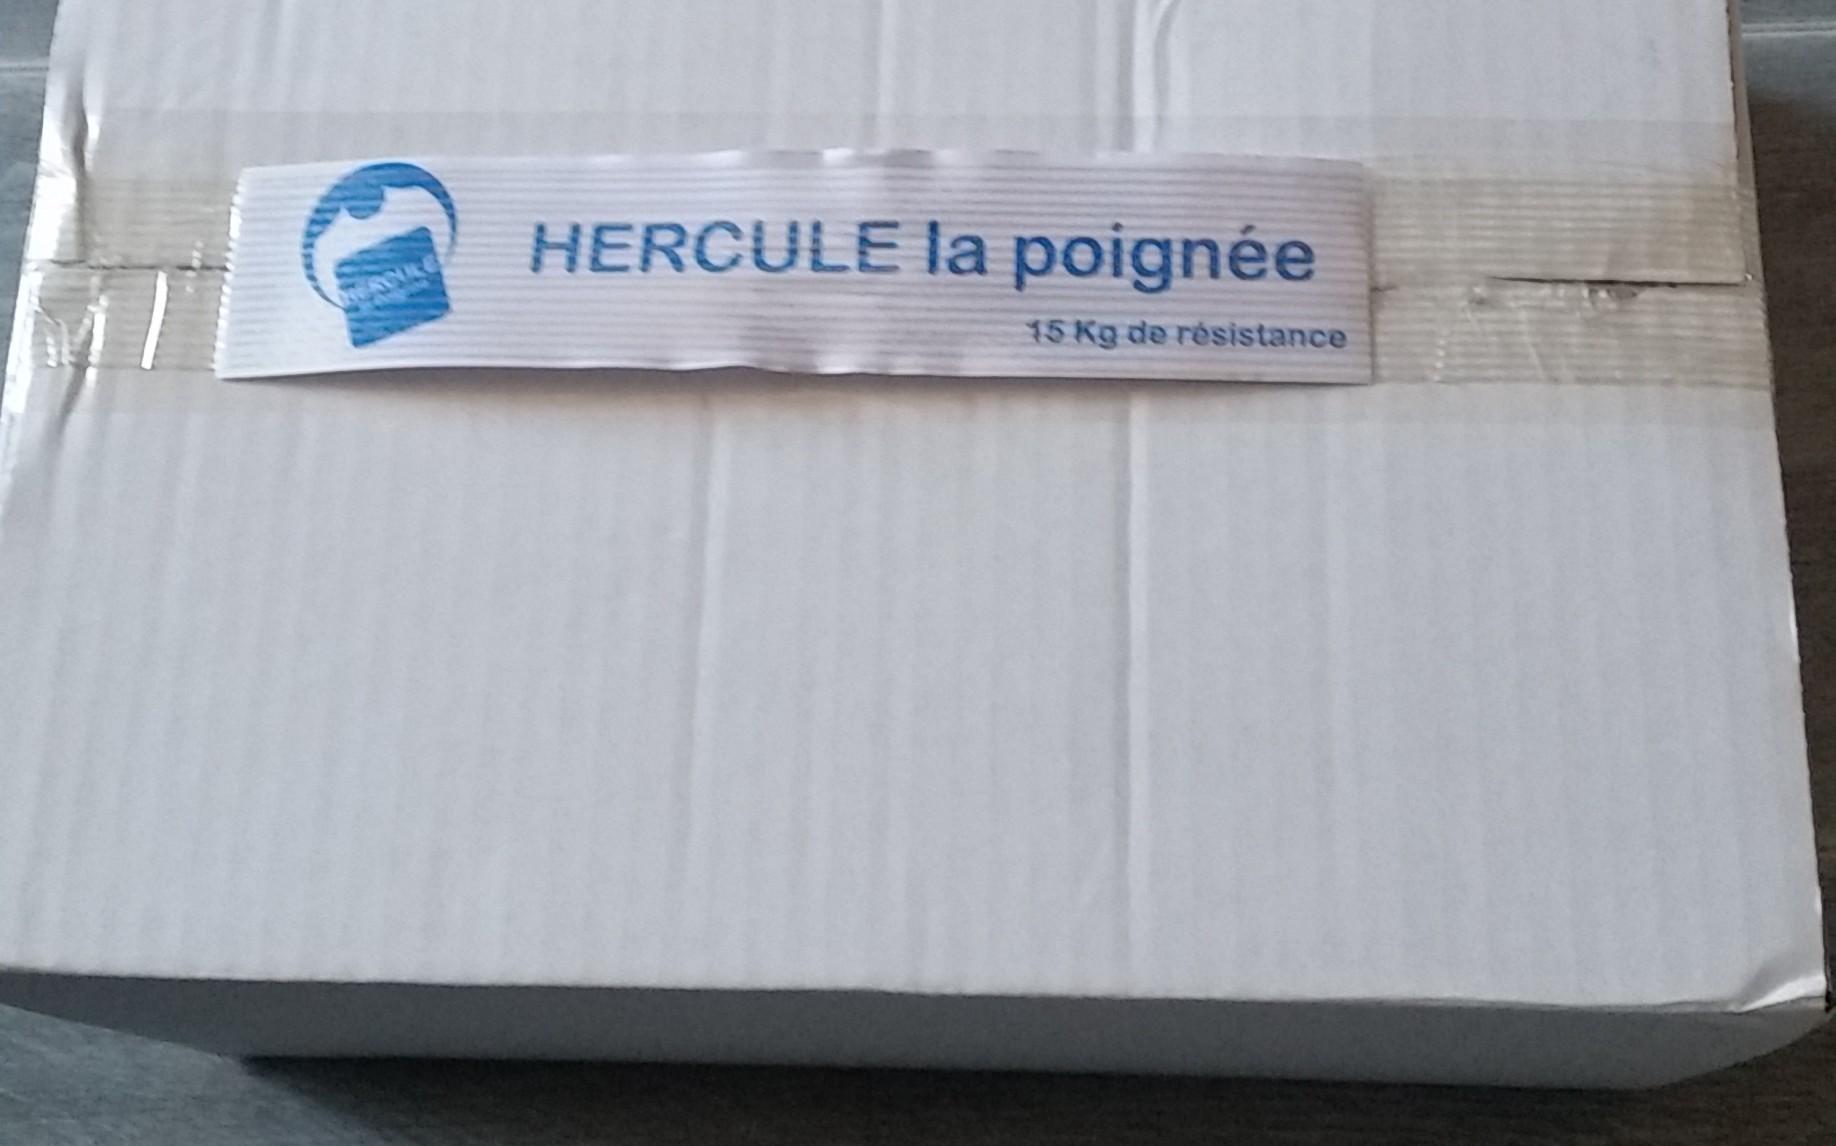 POIGNEE HERCULE 15 KGS